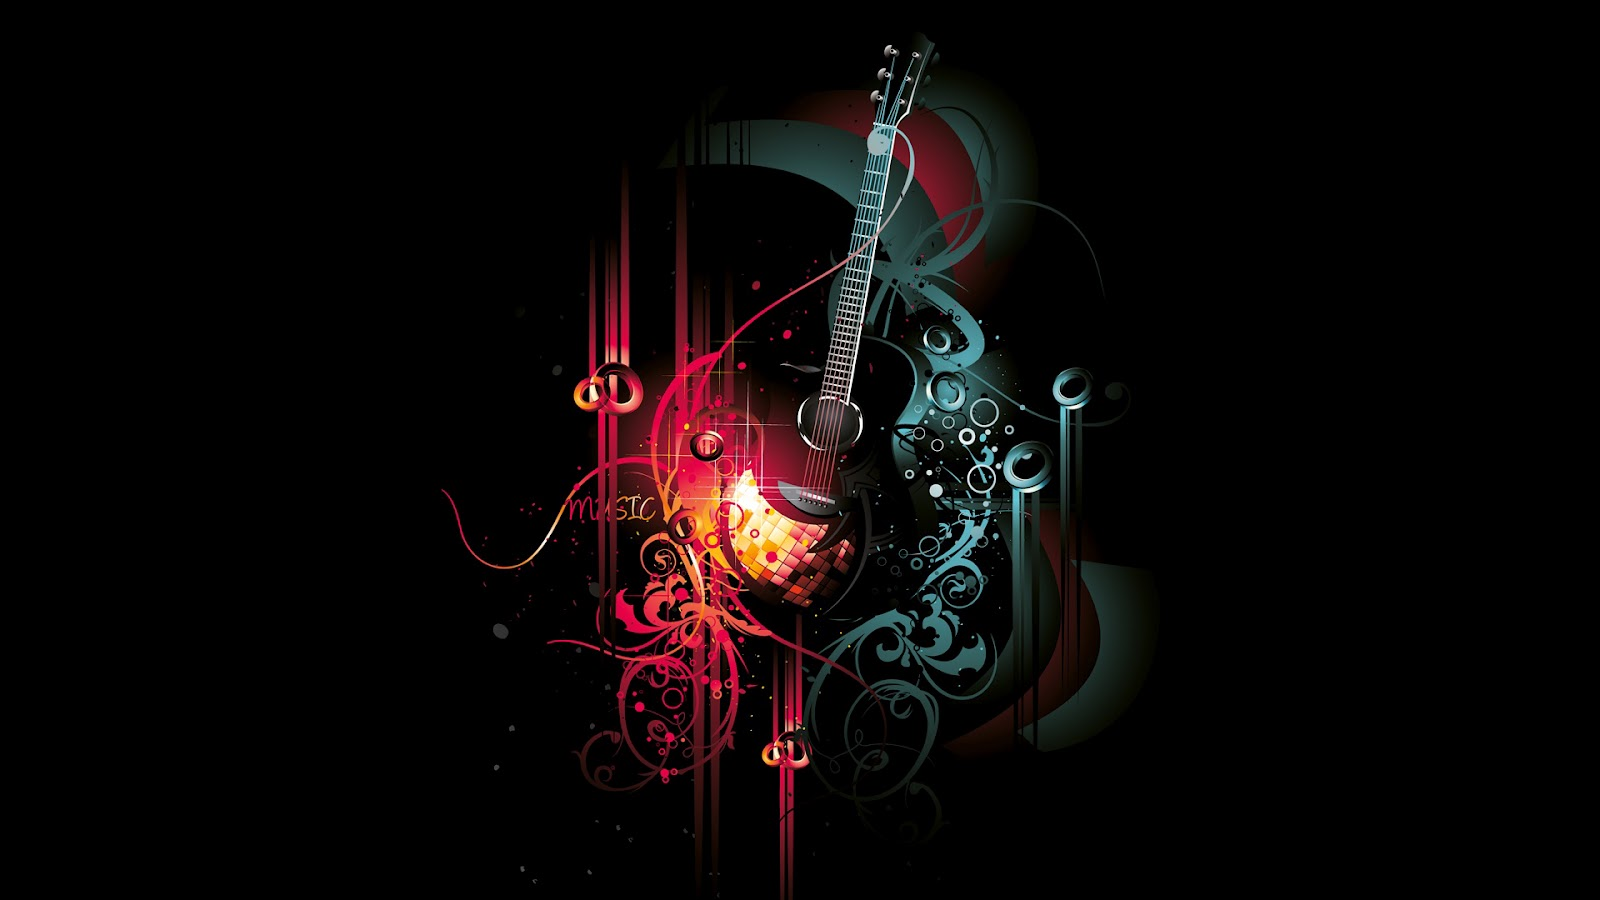 Wallpaper music for pc impact wallpapers - Wallpaper artist music ...